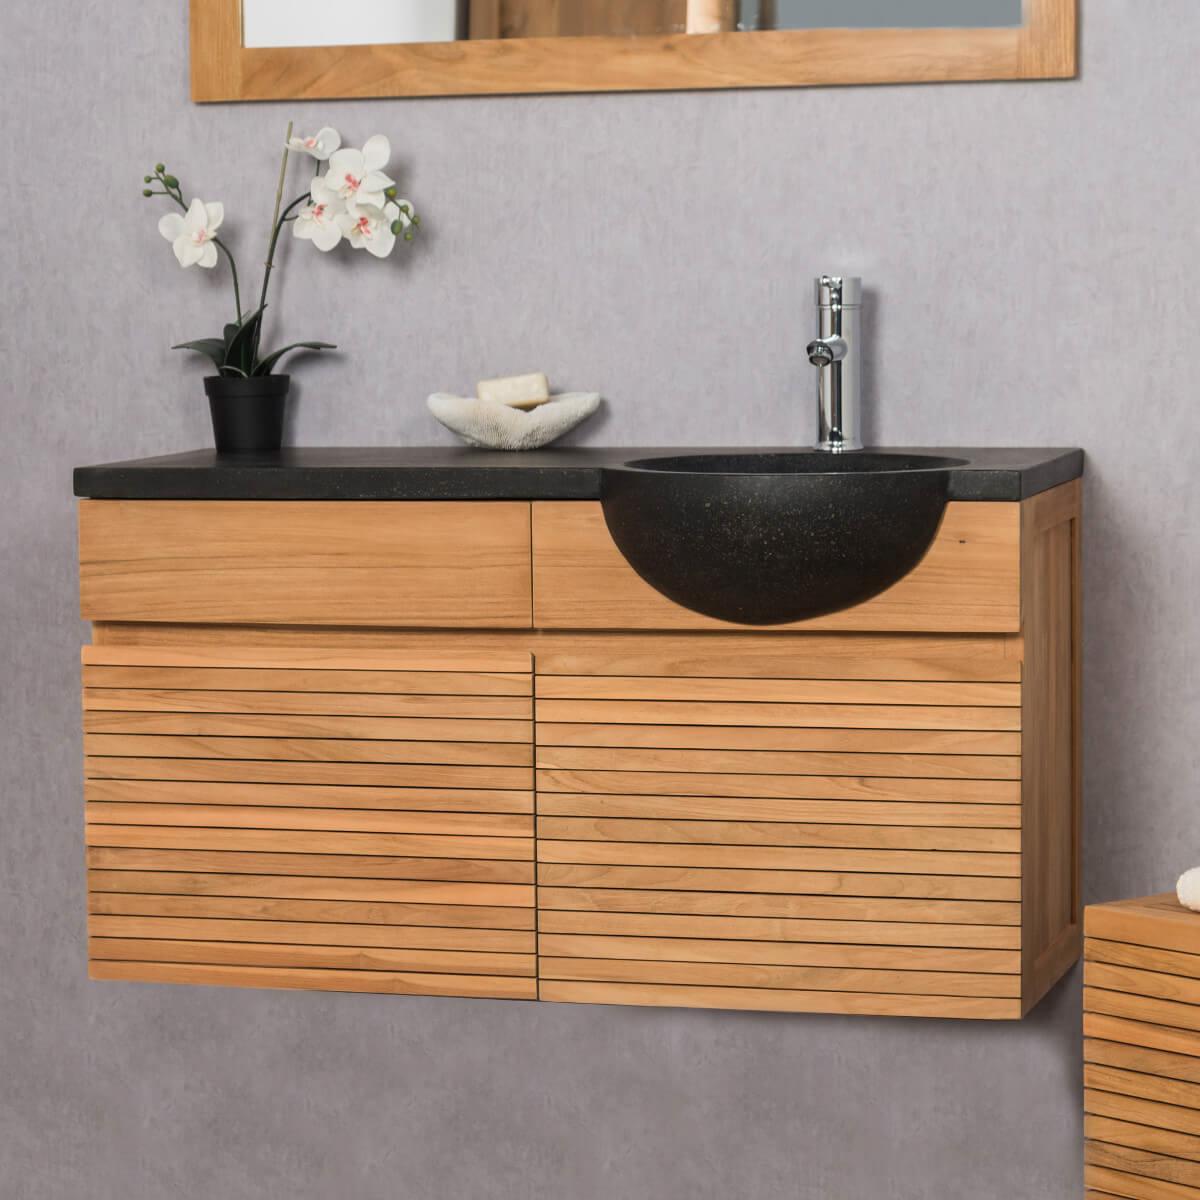 meuble salle de bain meuble suspendu teck avec vasque. Black Bedroom Furniture Sets. Home Design Ideas